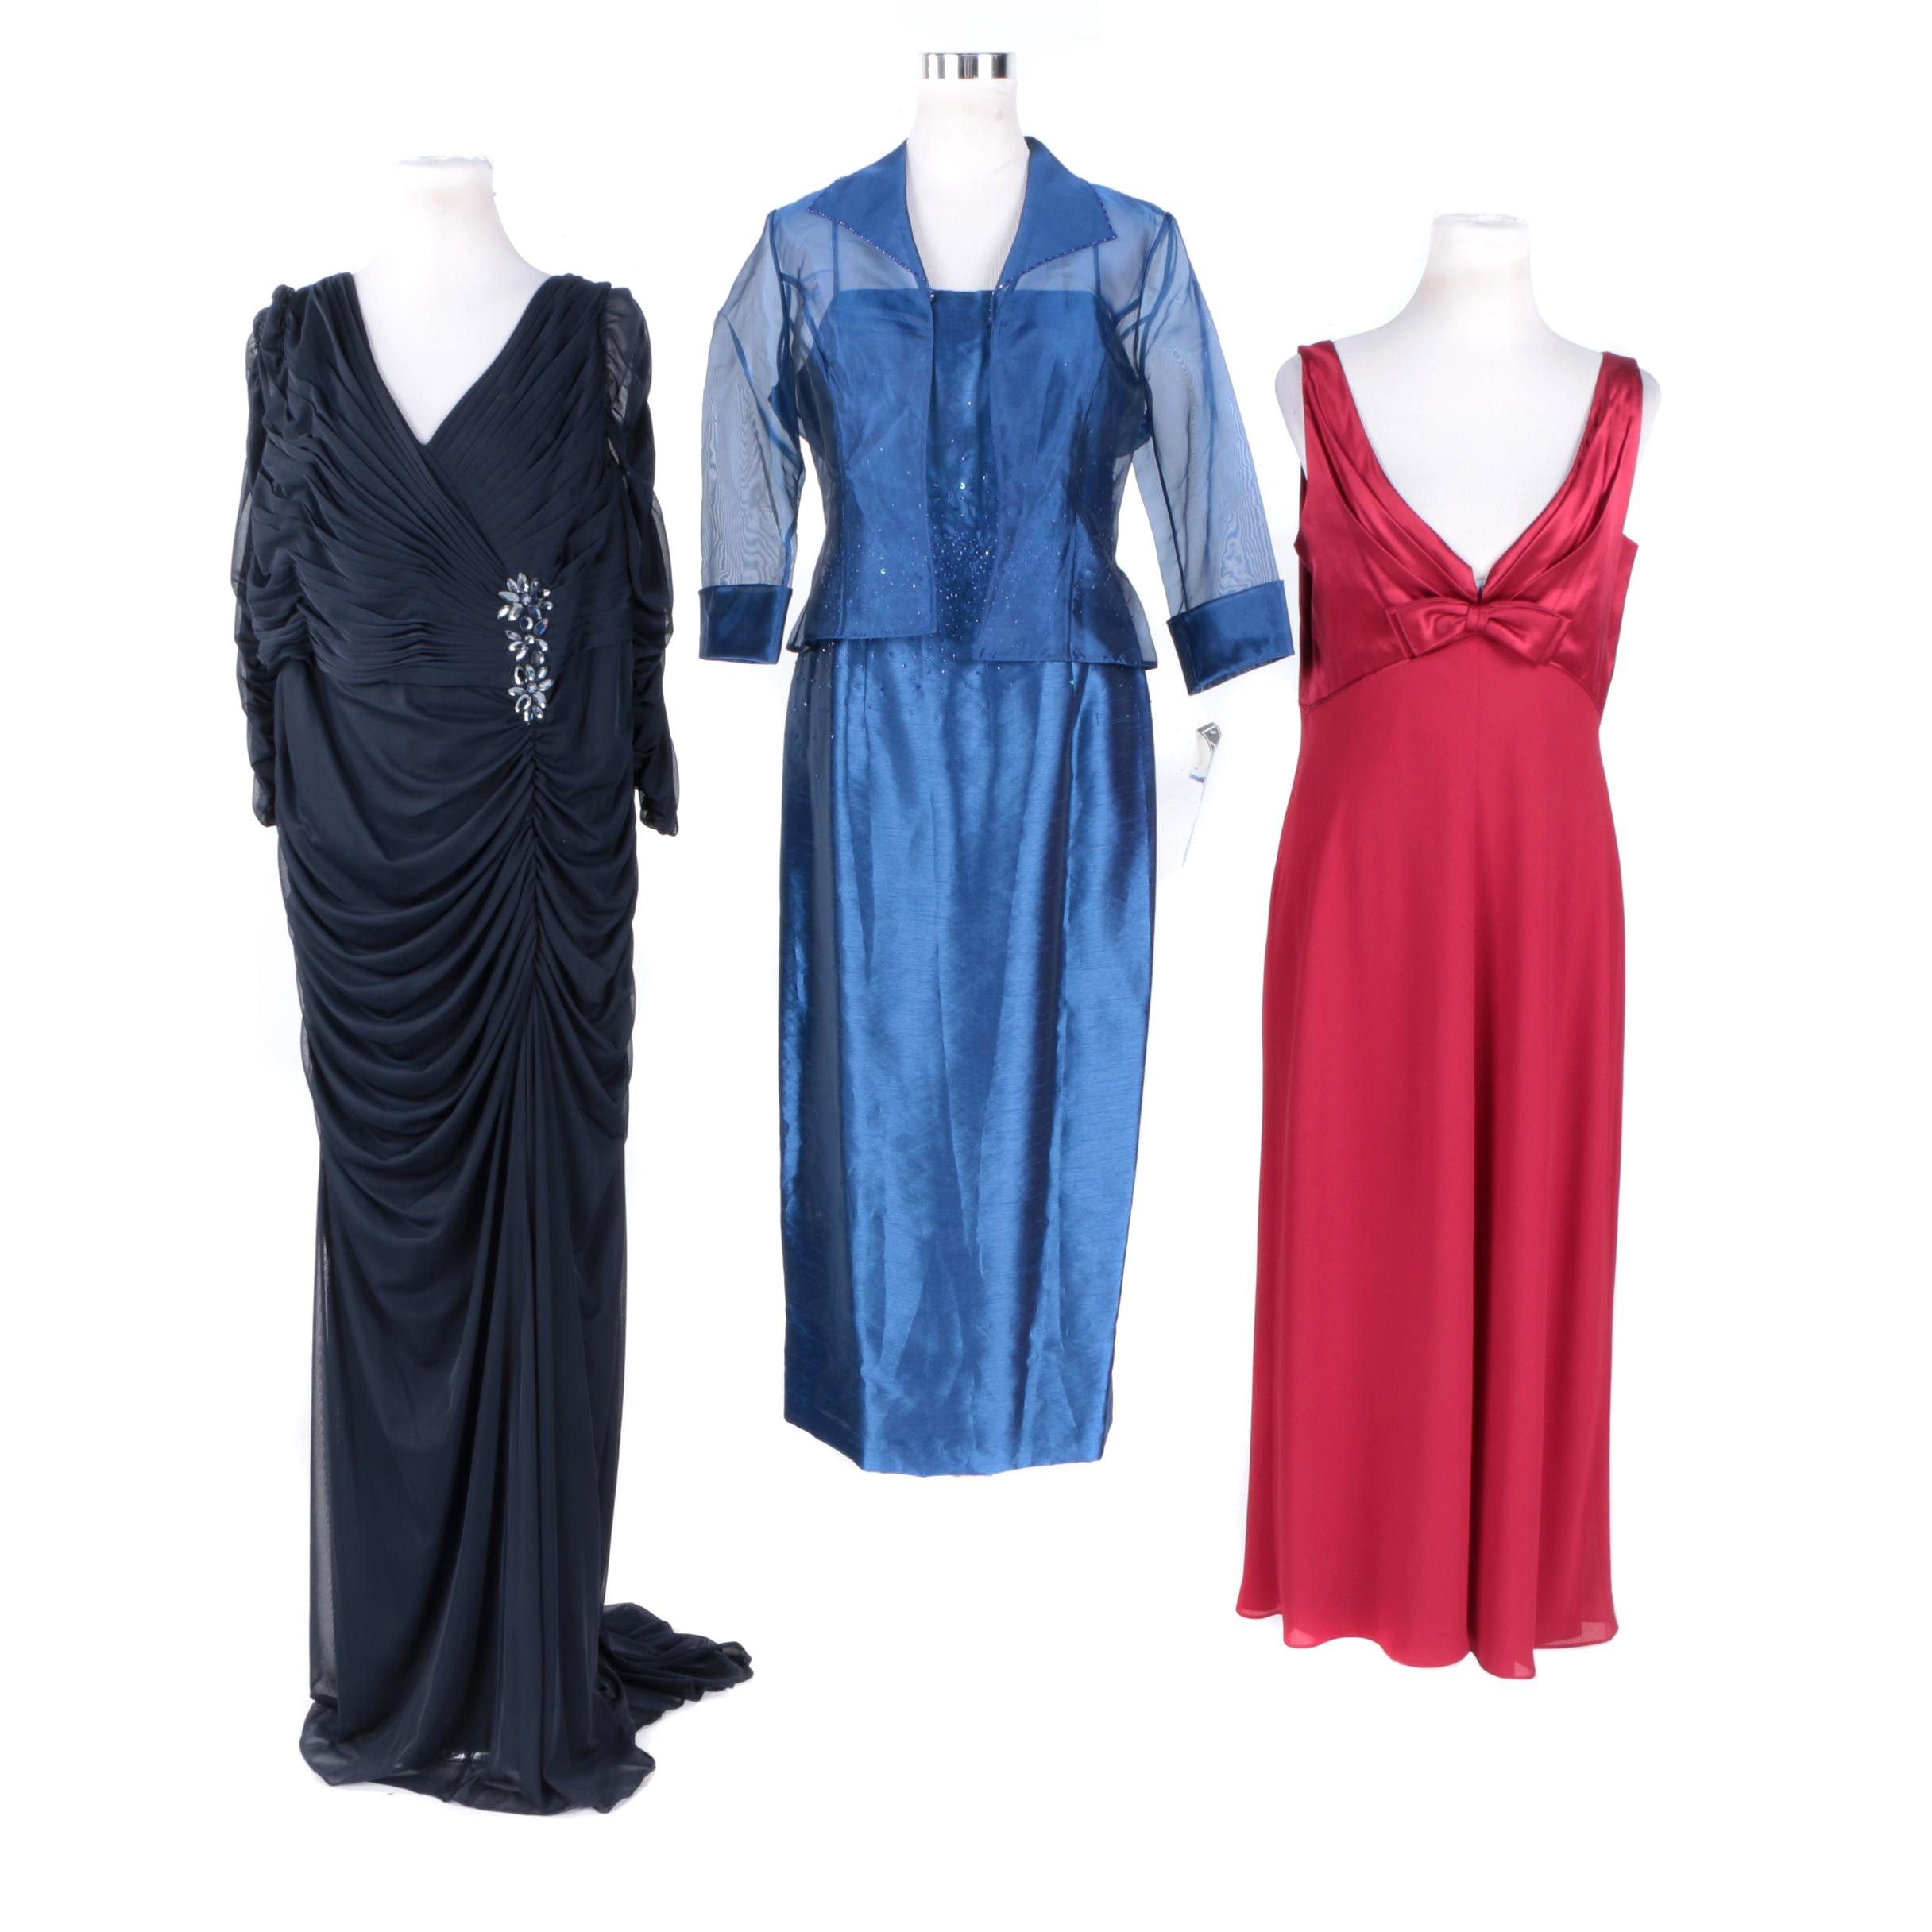 Women's Evening Dresses Including Adrianna Papell